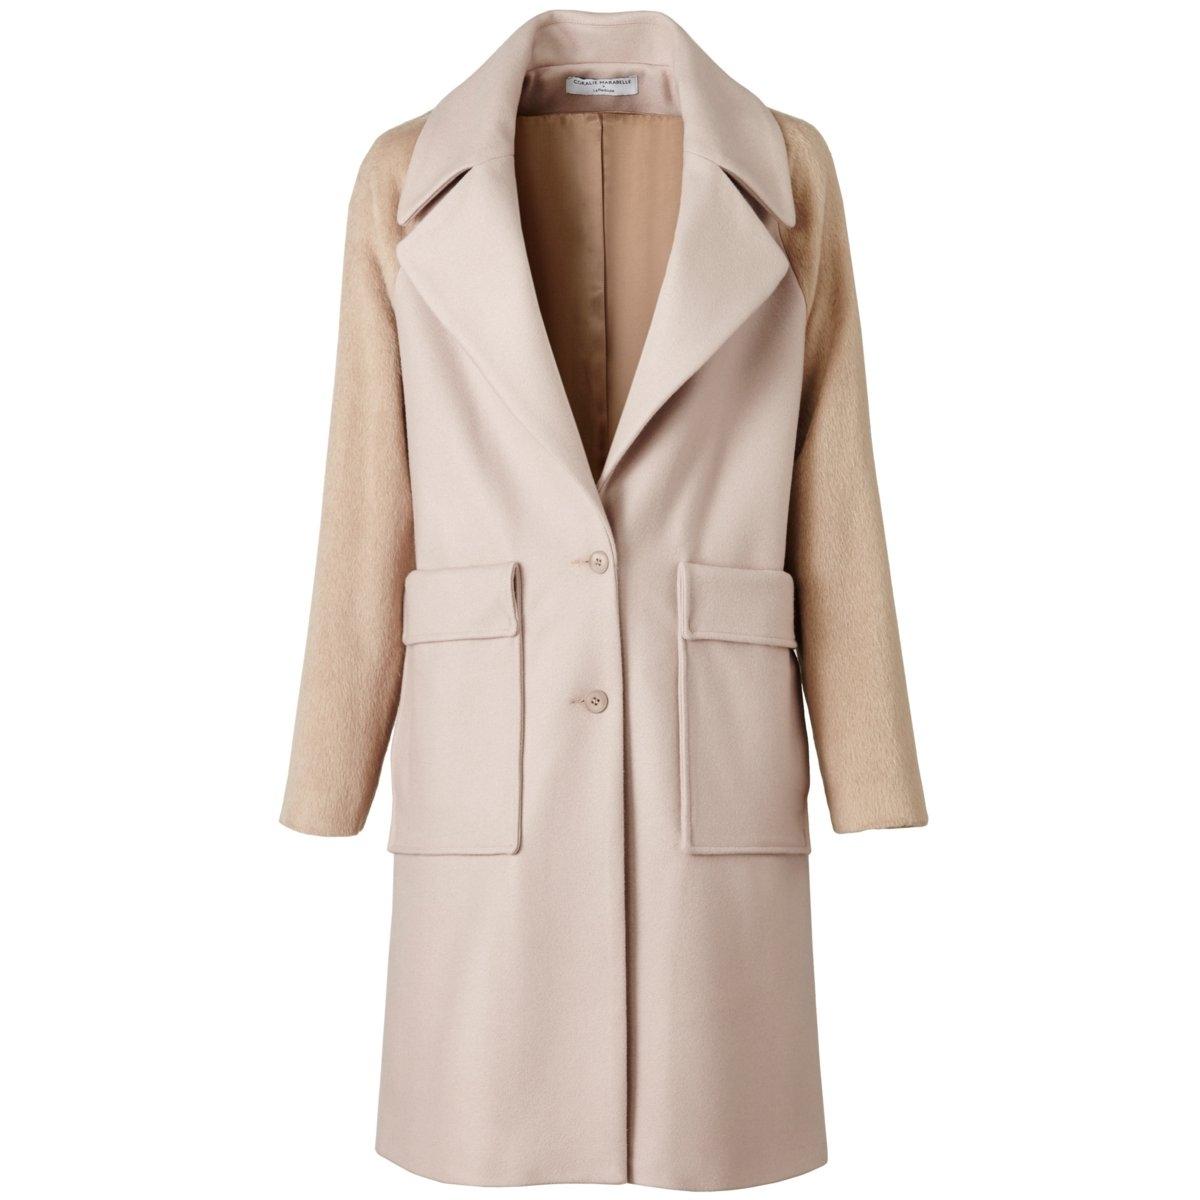 Пальто прямого покроя<br><br>Цвет: темно-бежевый,черный<br>Размер: 40 (FR) - 46 (RUS).40 (FR) - 46 (RUS).44 (FR) - 50 (RUS)